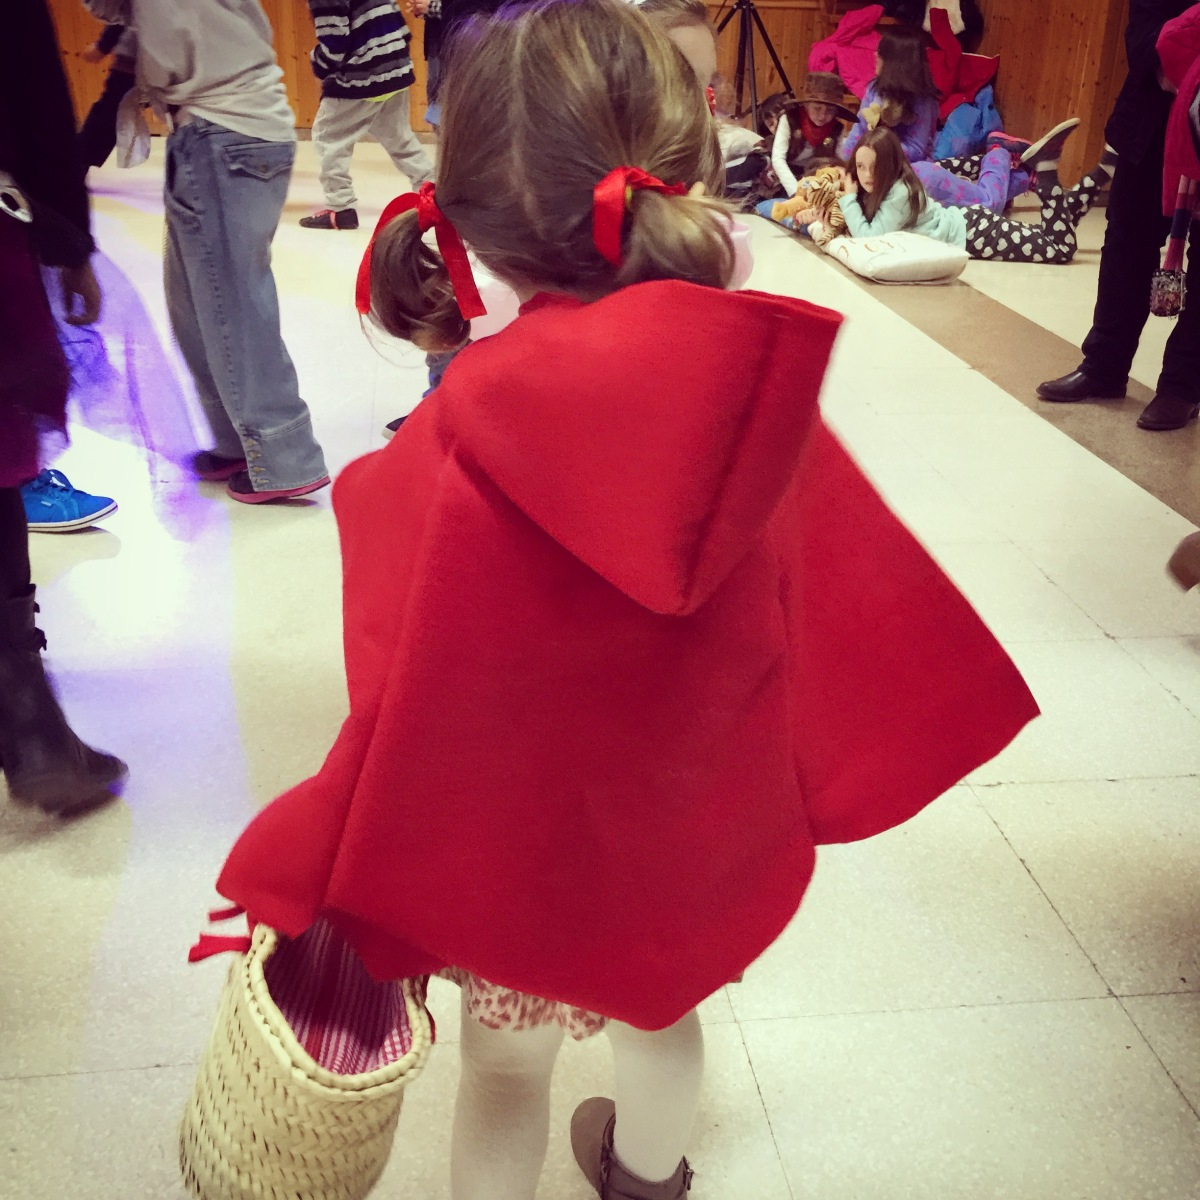 Inspiración de Carnaval: la de la caperuza roja